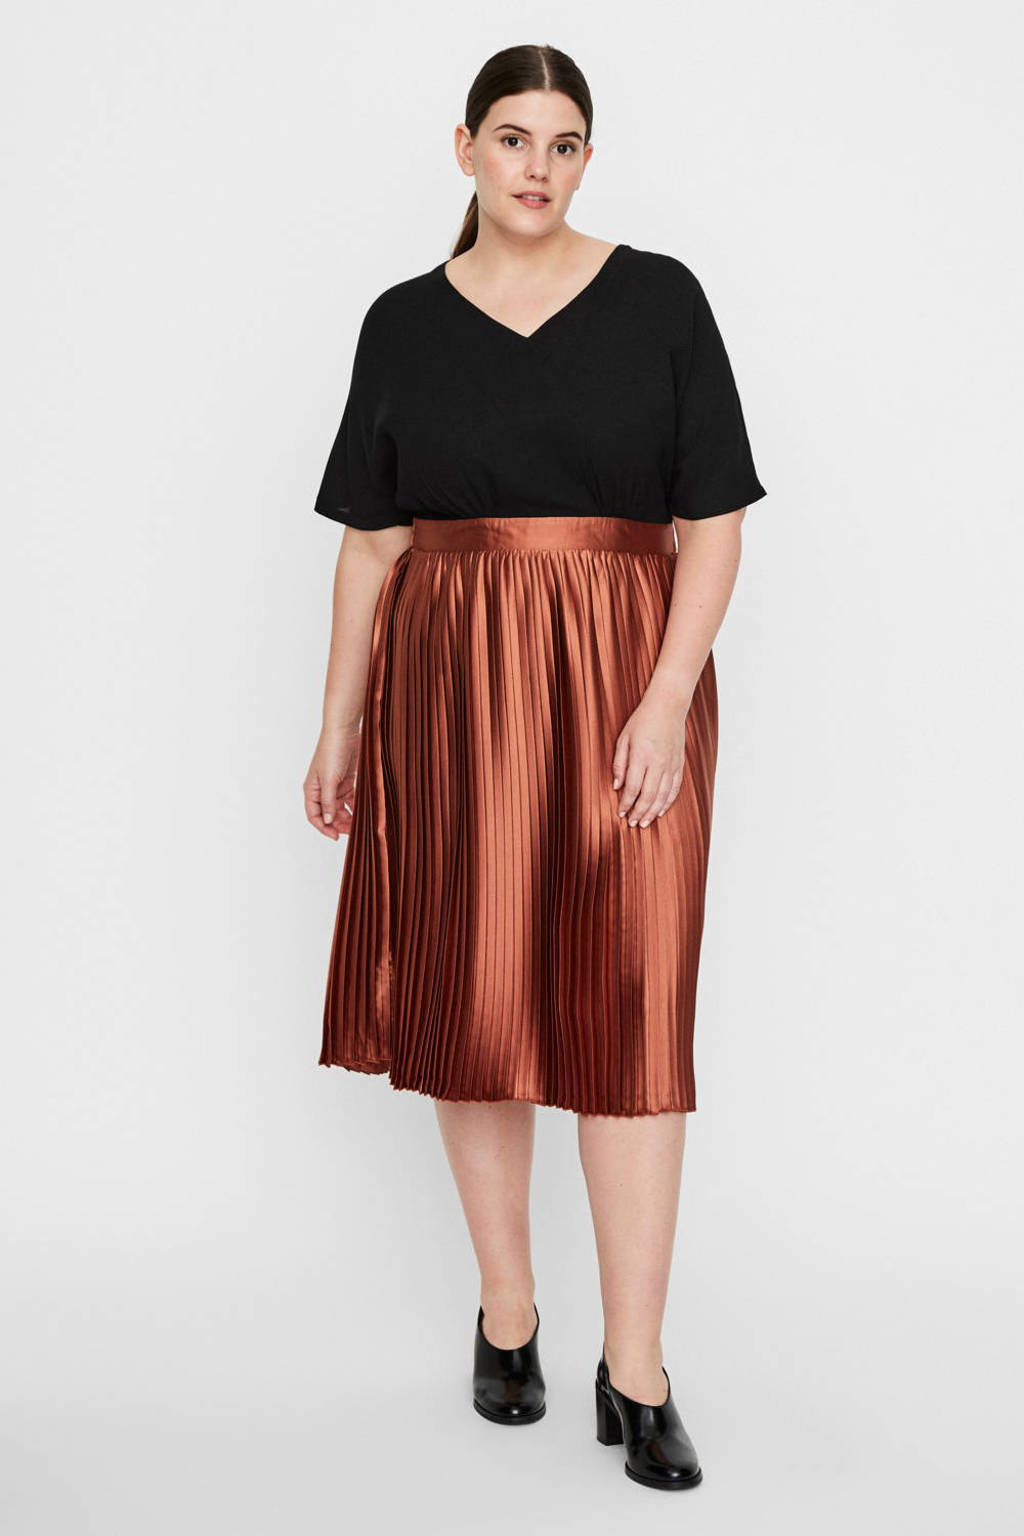 I.SCENERY jurk koper/zwart, Koper/zwart